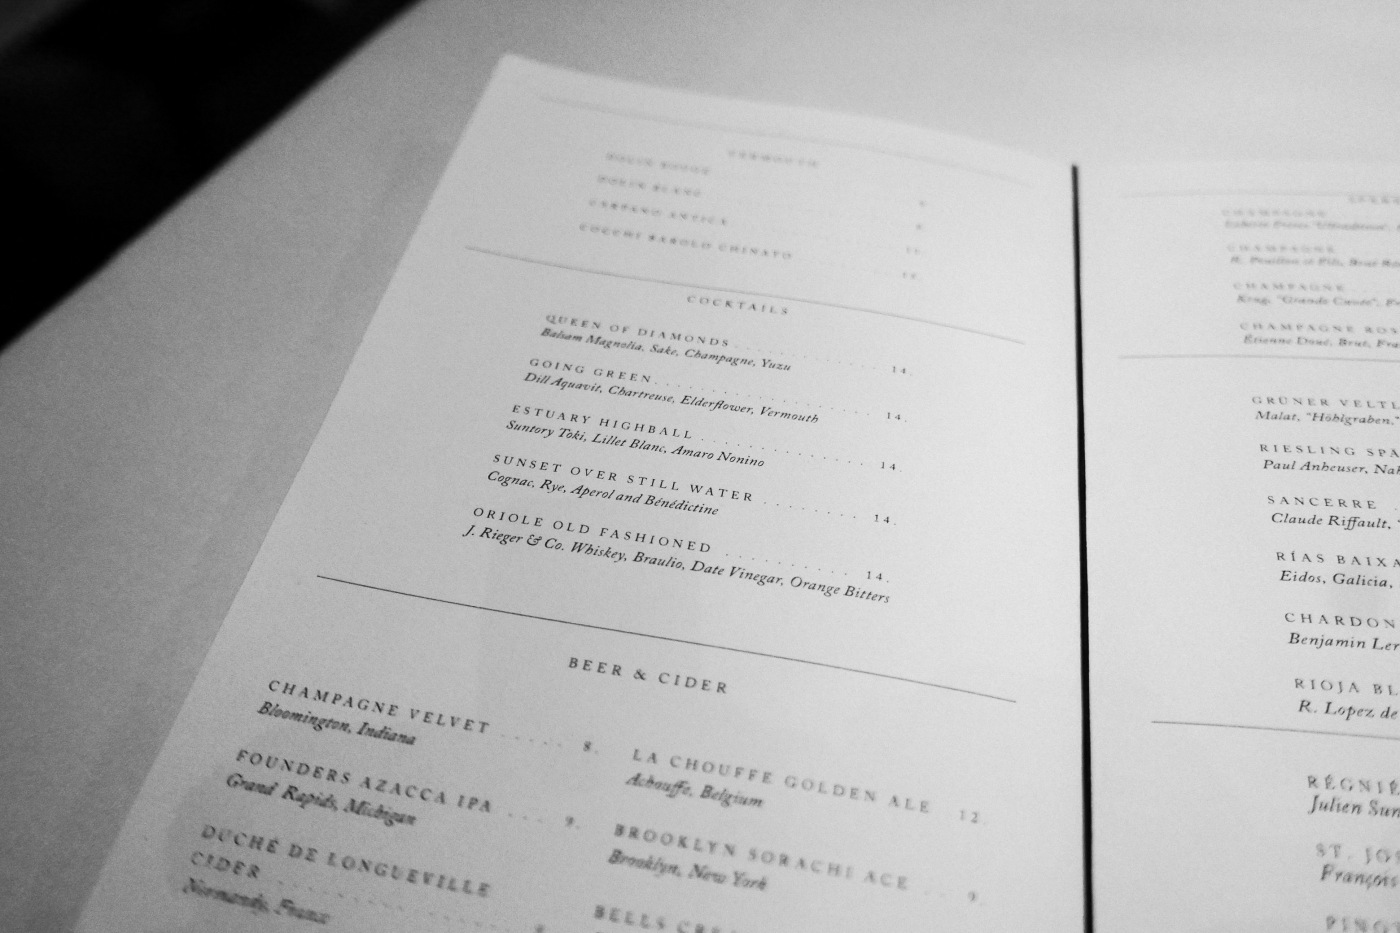 Beverage menu at Oriole